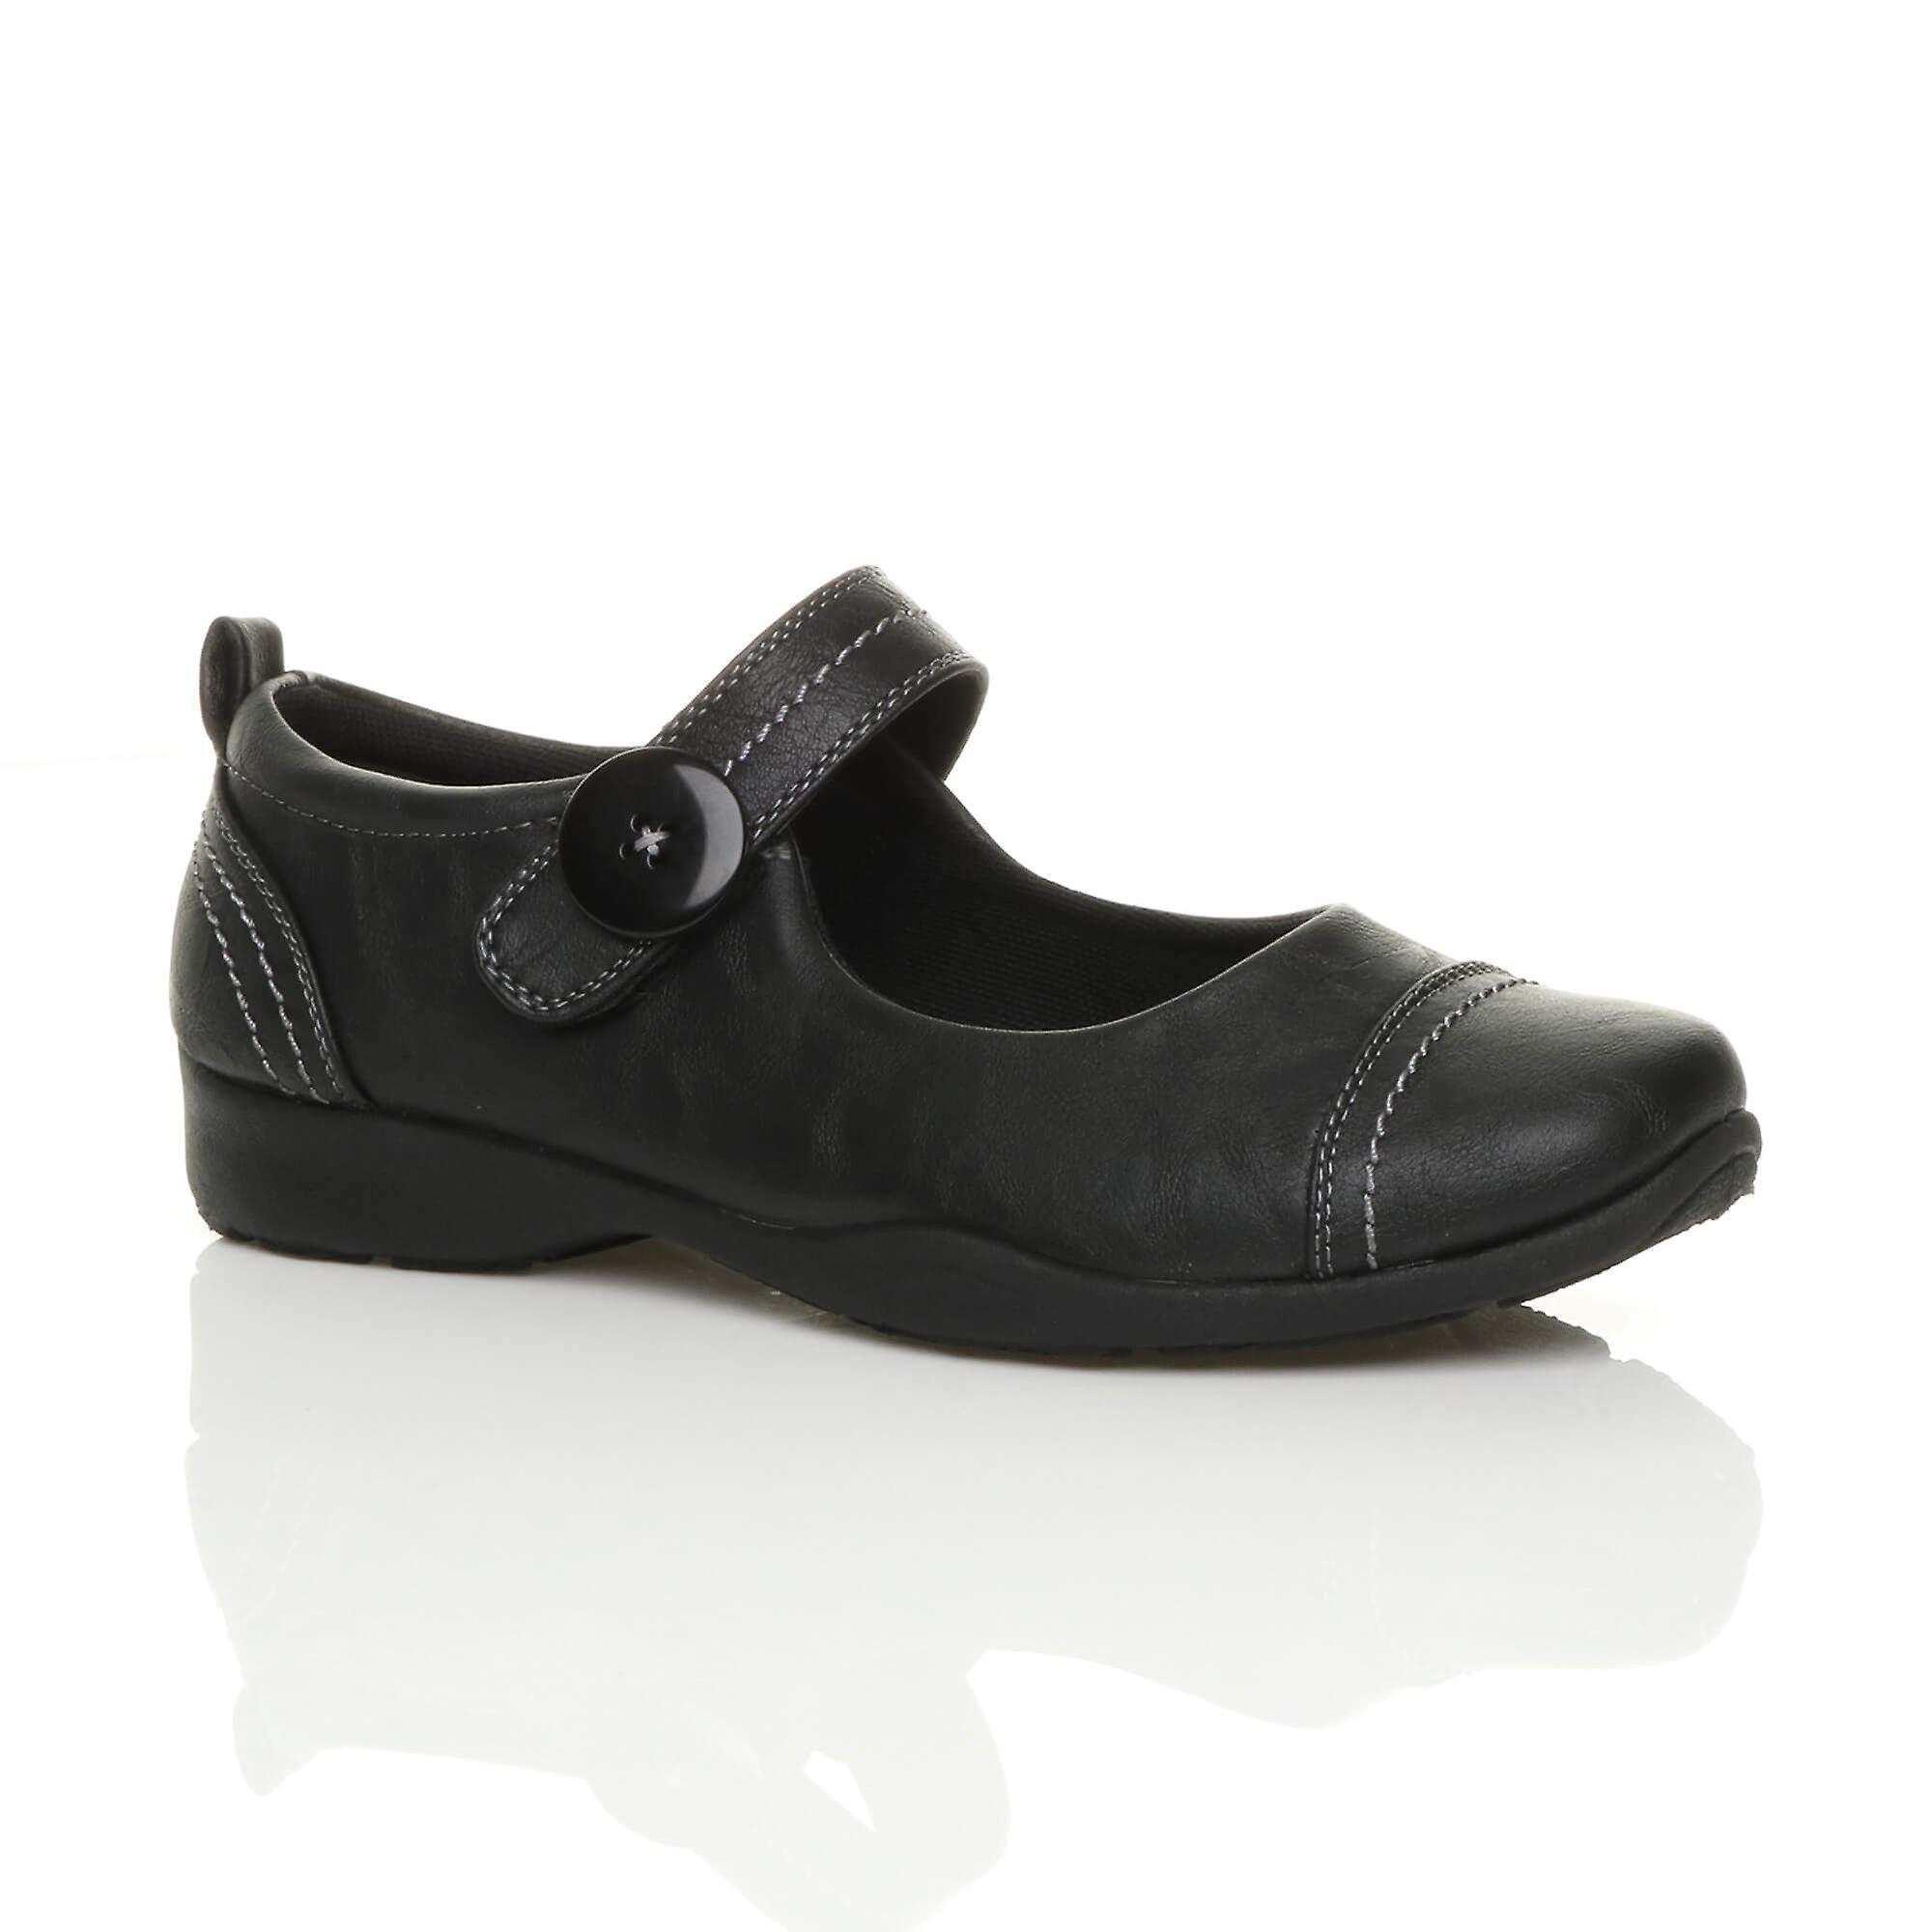 Ajvani womens low heel mary jane strap walking work flexible comfort shoes